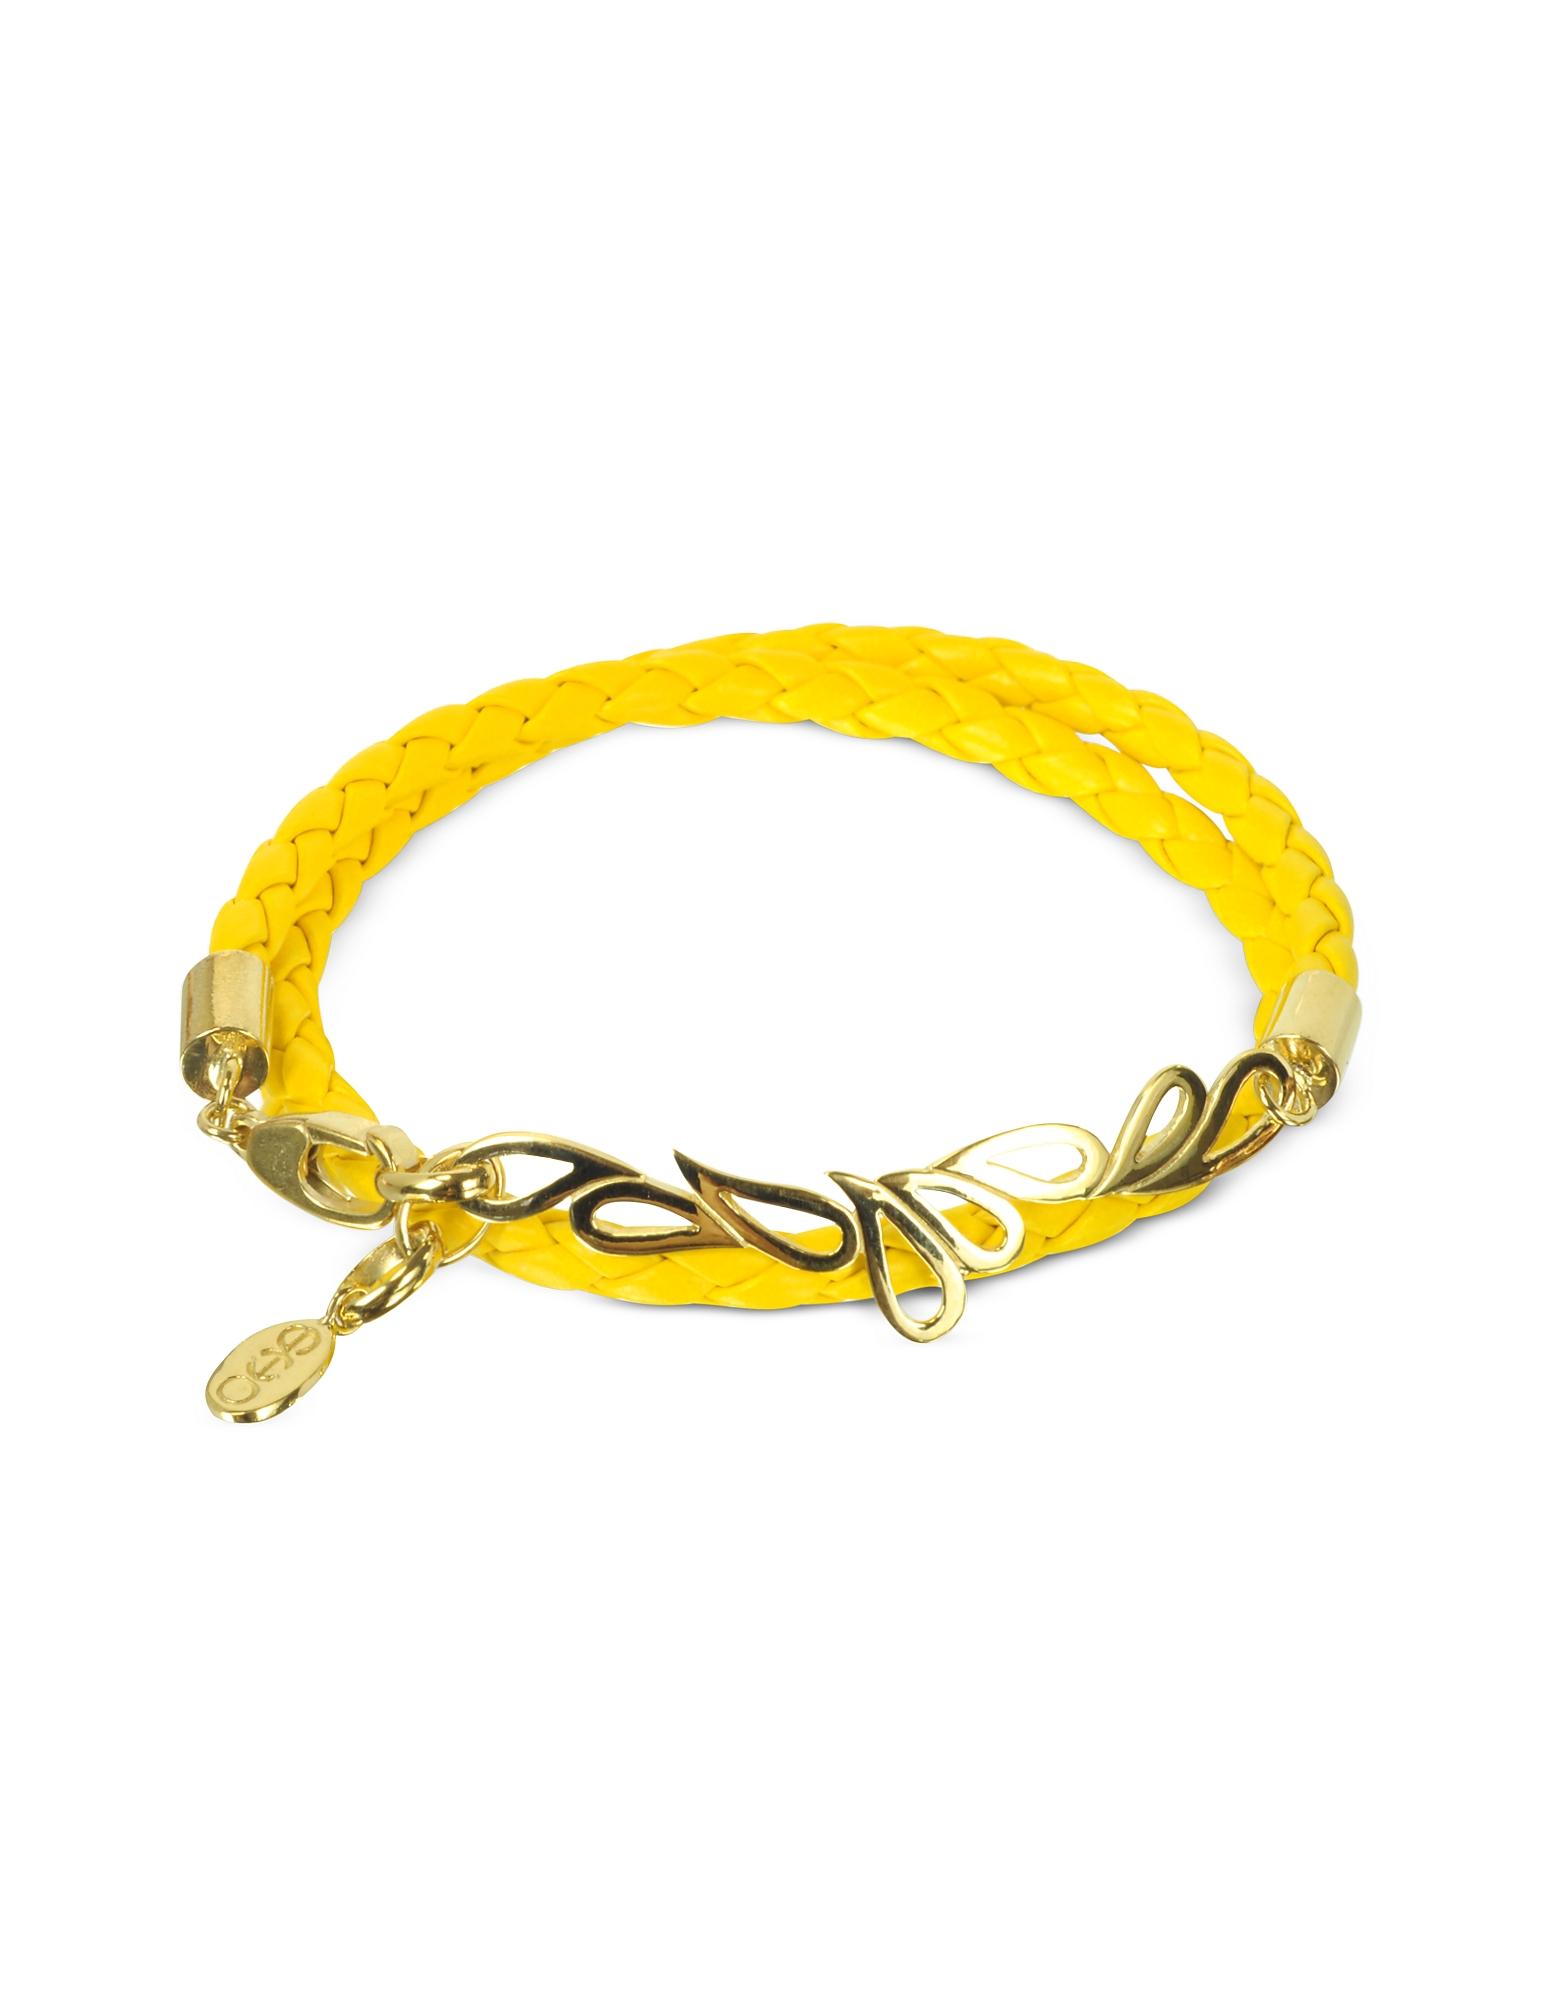 Sho London Bracelets, Mari Fiendship Silver Vermail & Leather Double Bracelet